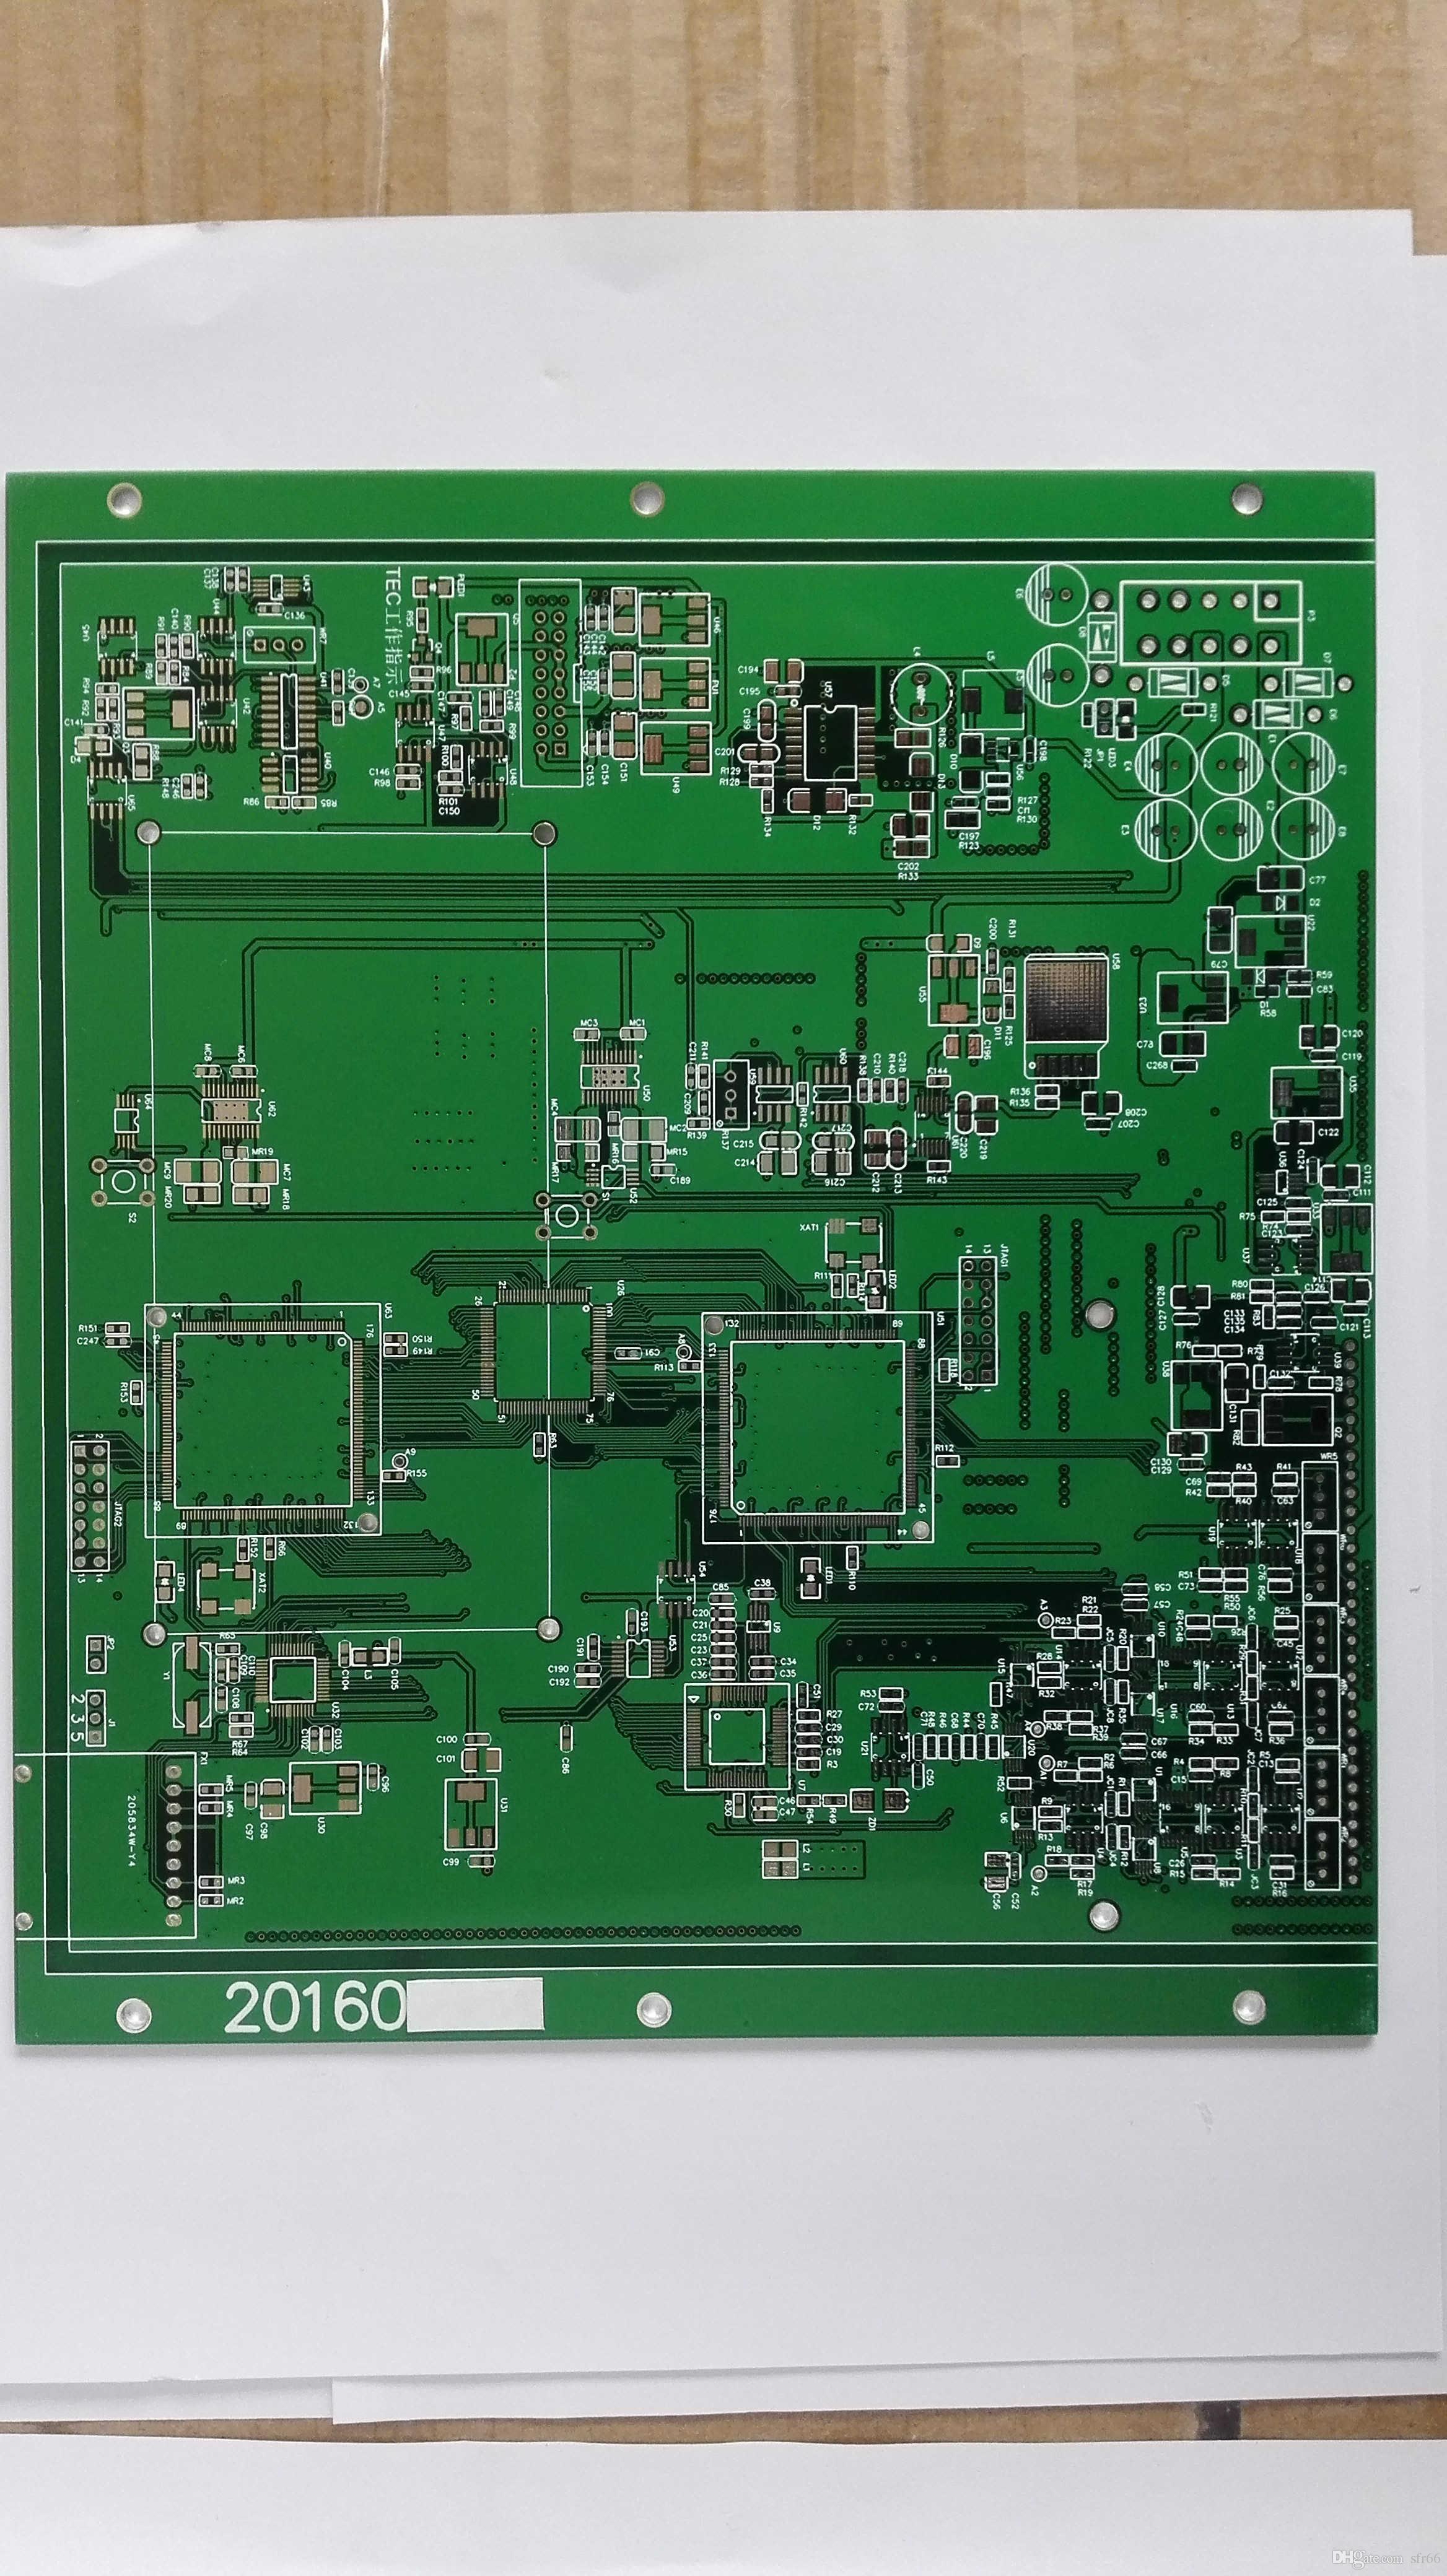 Circuito Impreso : Compre pcb fabricación de placas de circuito impreso por lotes